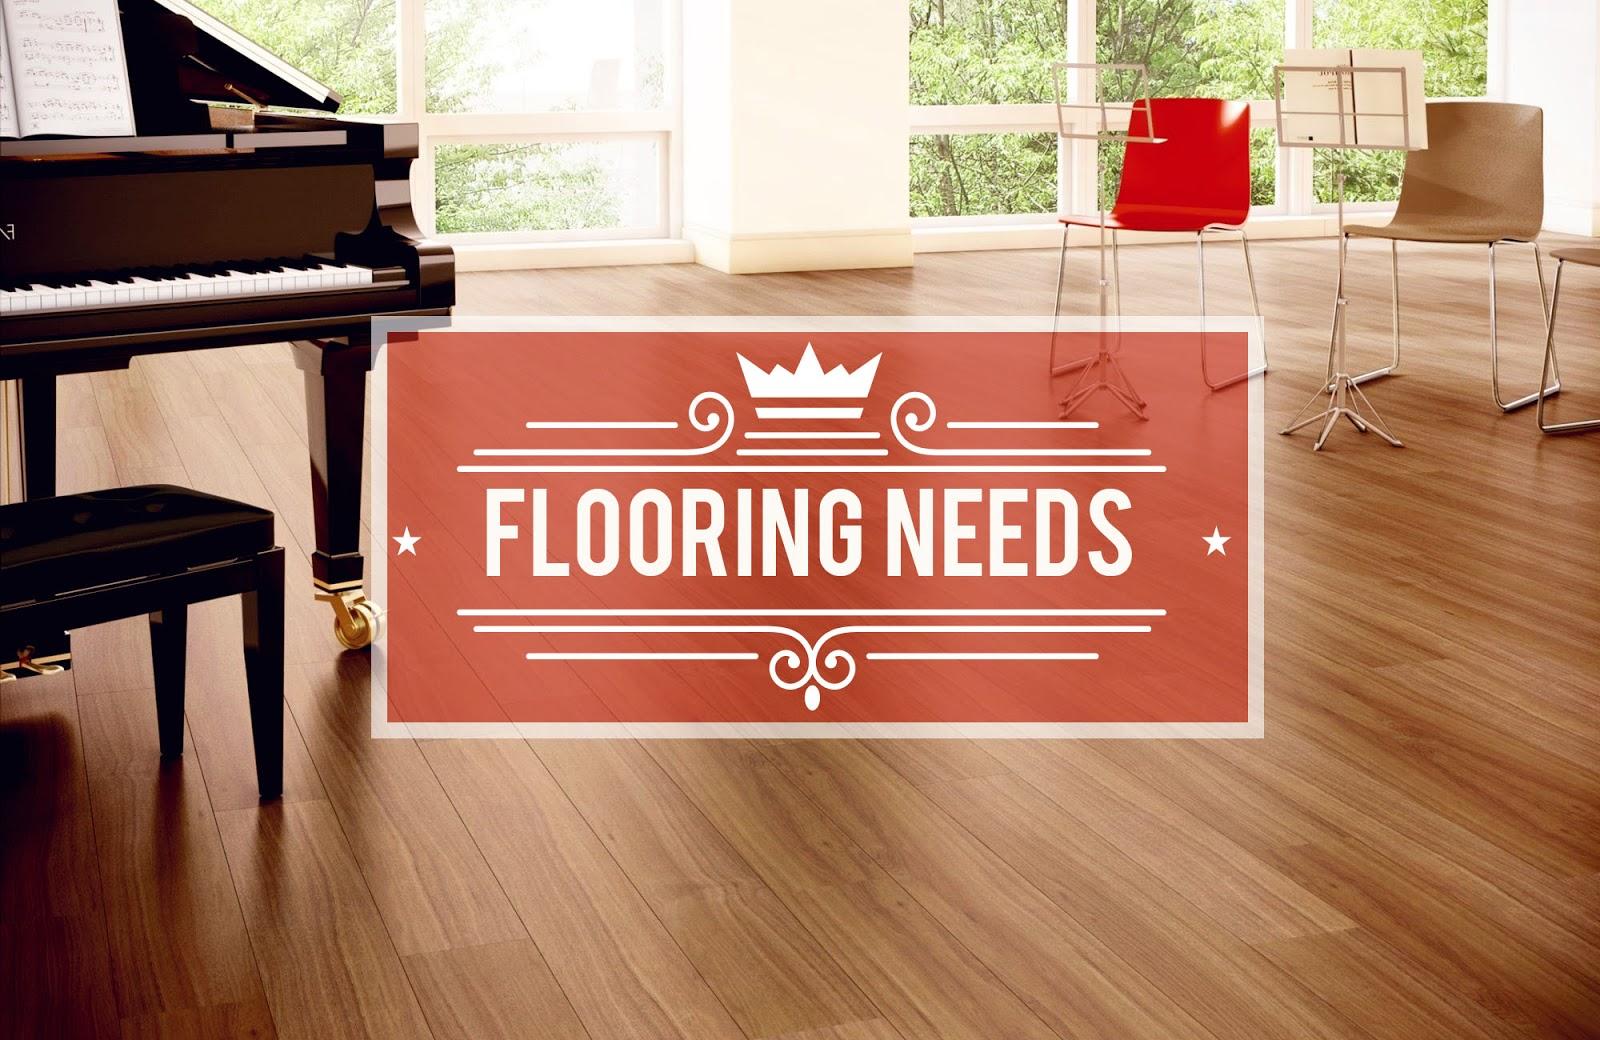 jual lantai flooring kayu vinyl surabaya murah ud sahabat baliwerti